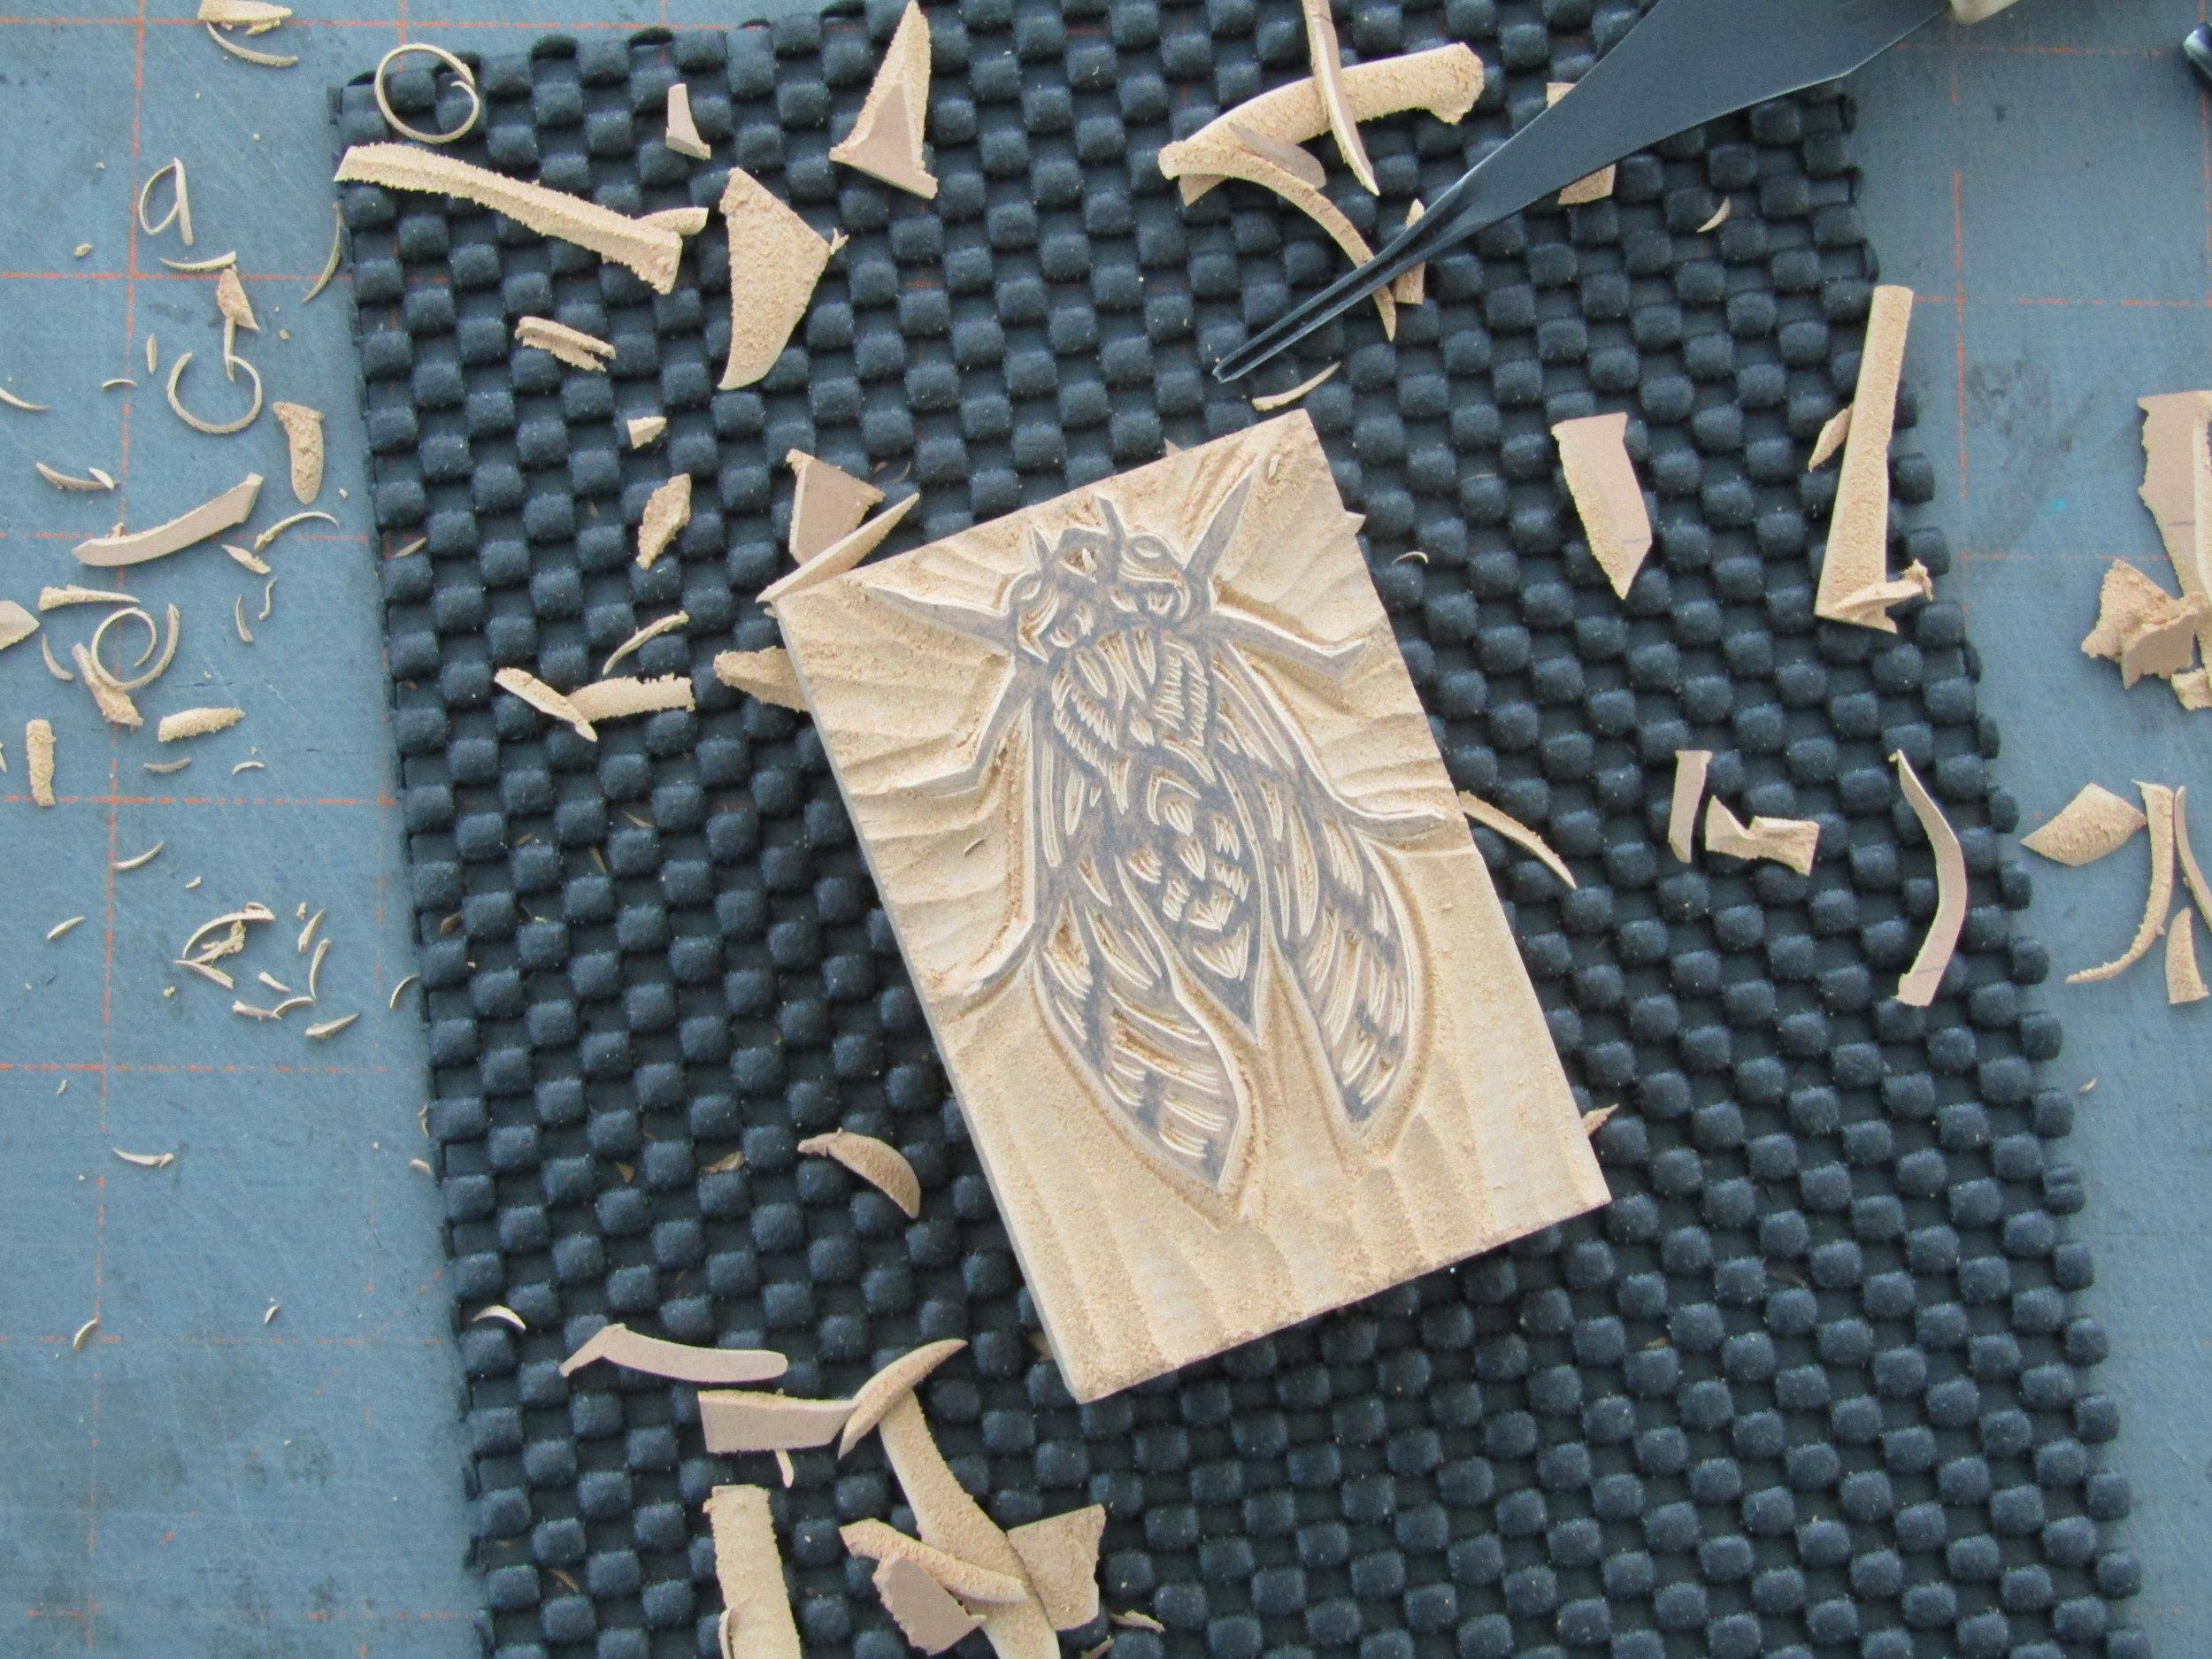 Carving the cicada.